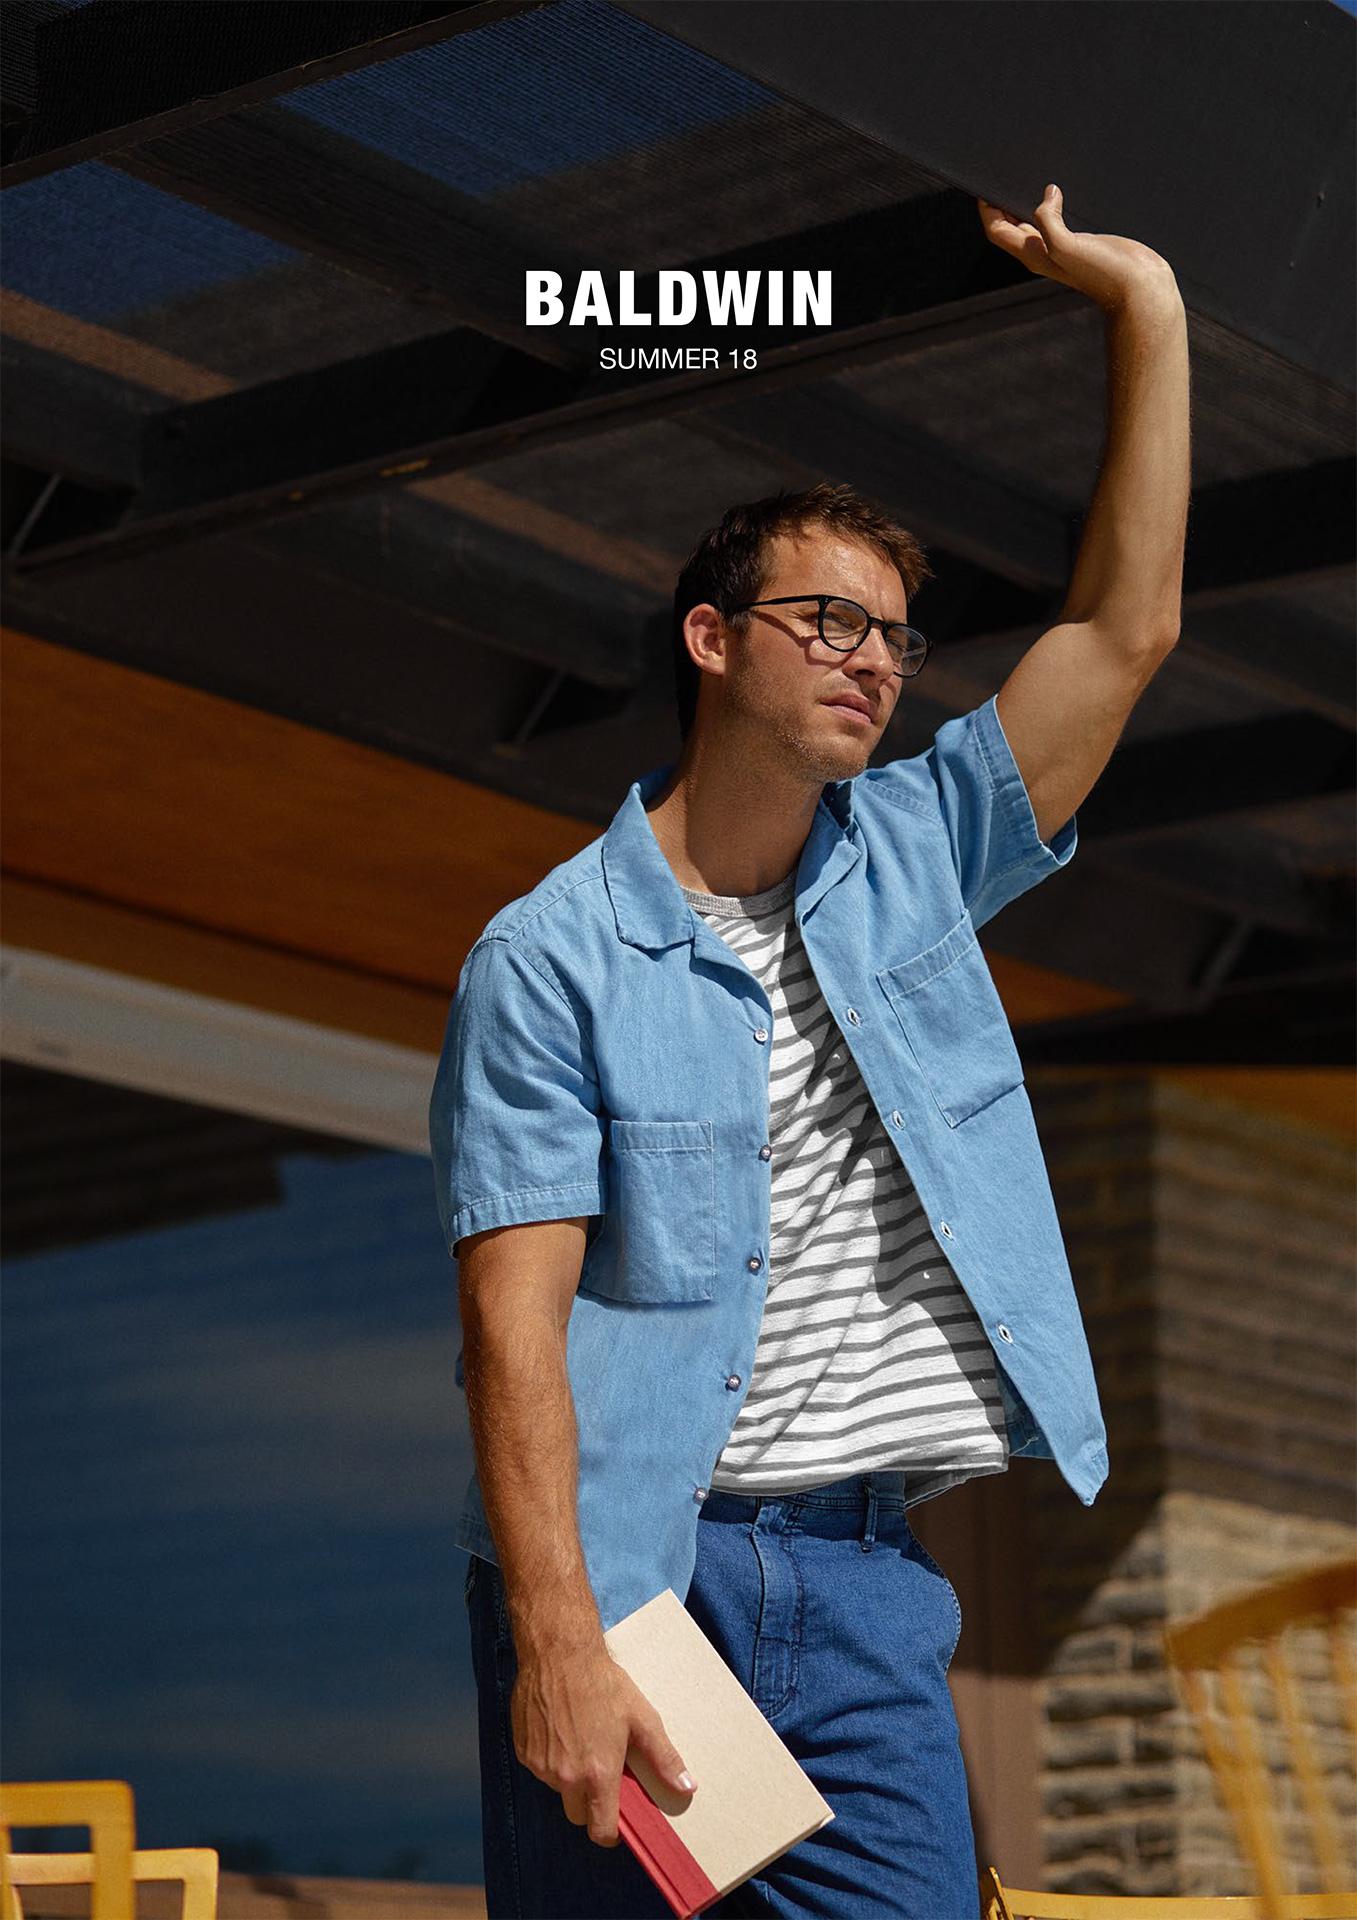 BALDWIN_18SU-MEN-1.jpg